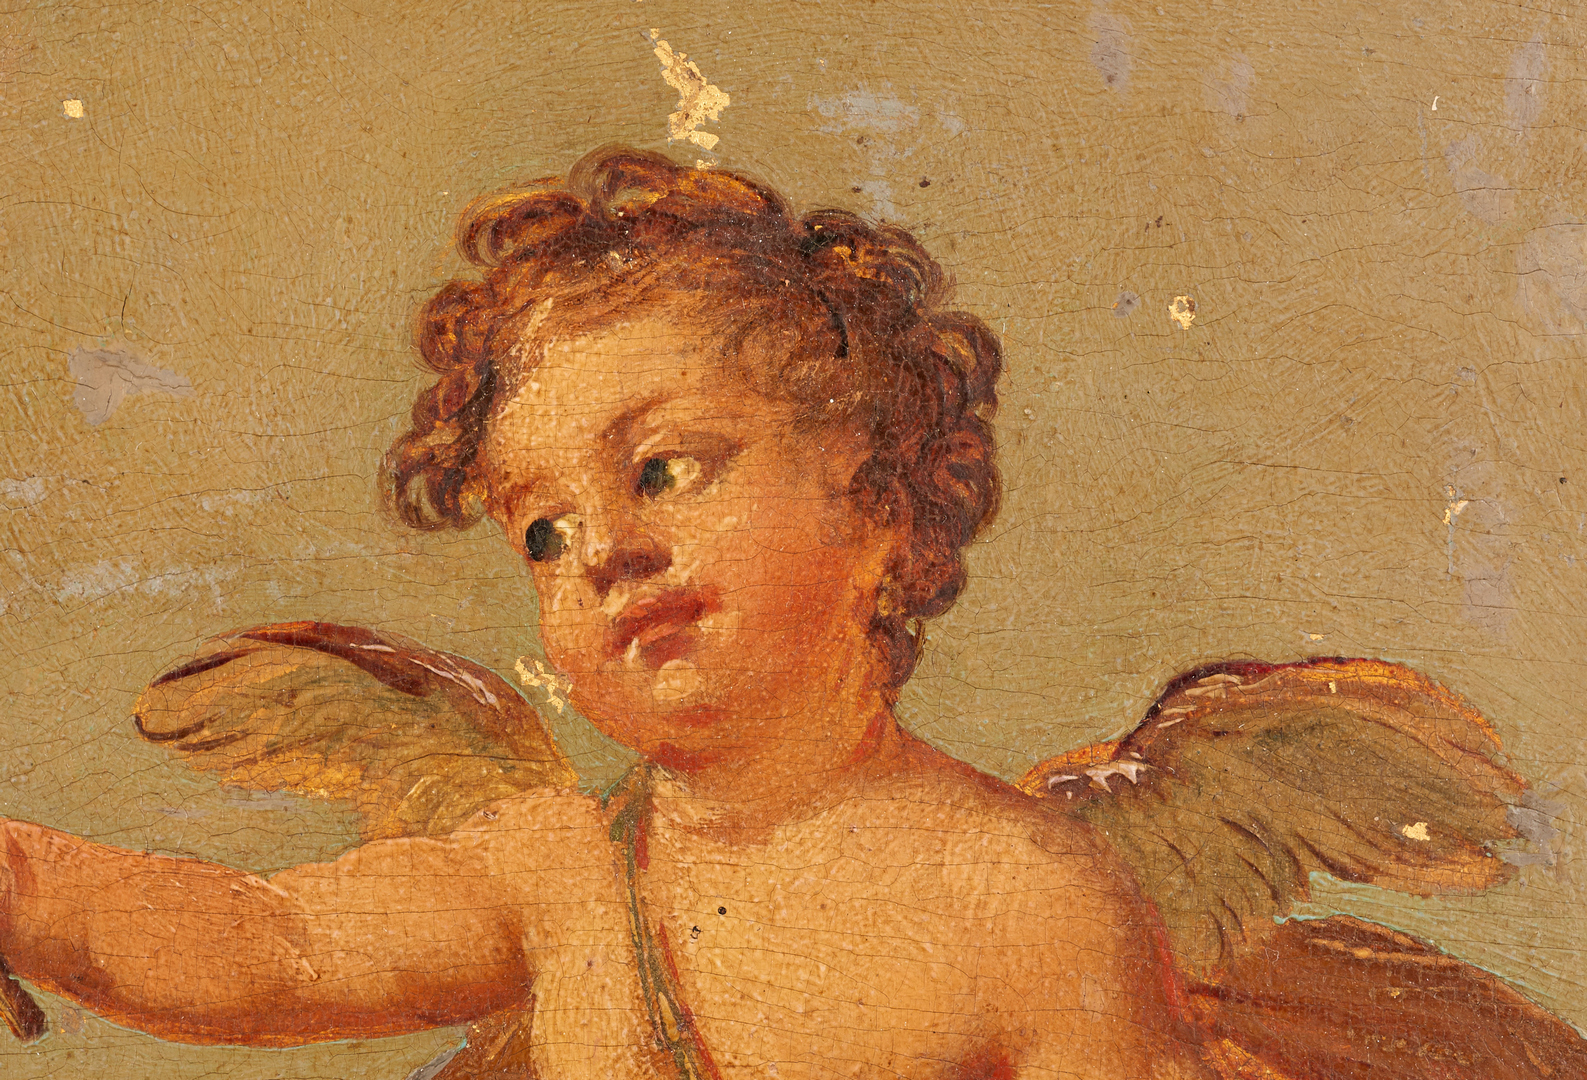 Lot 87: Attr. Christian W.E. Dietrich, 2 Cherub Paintings